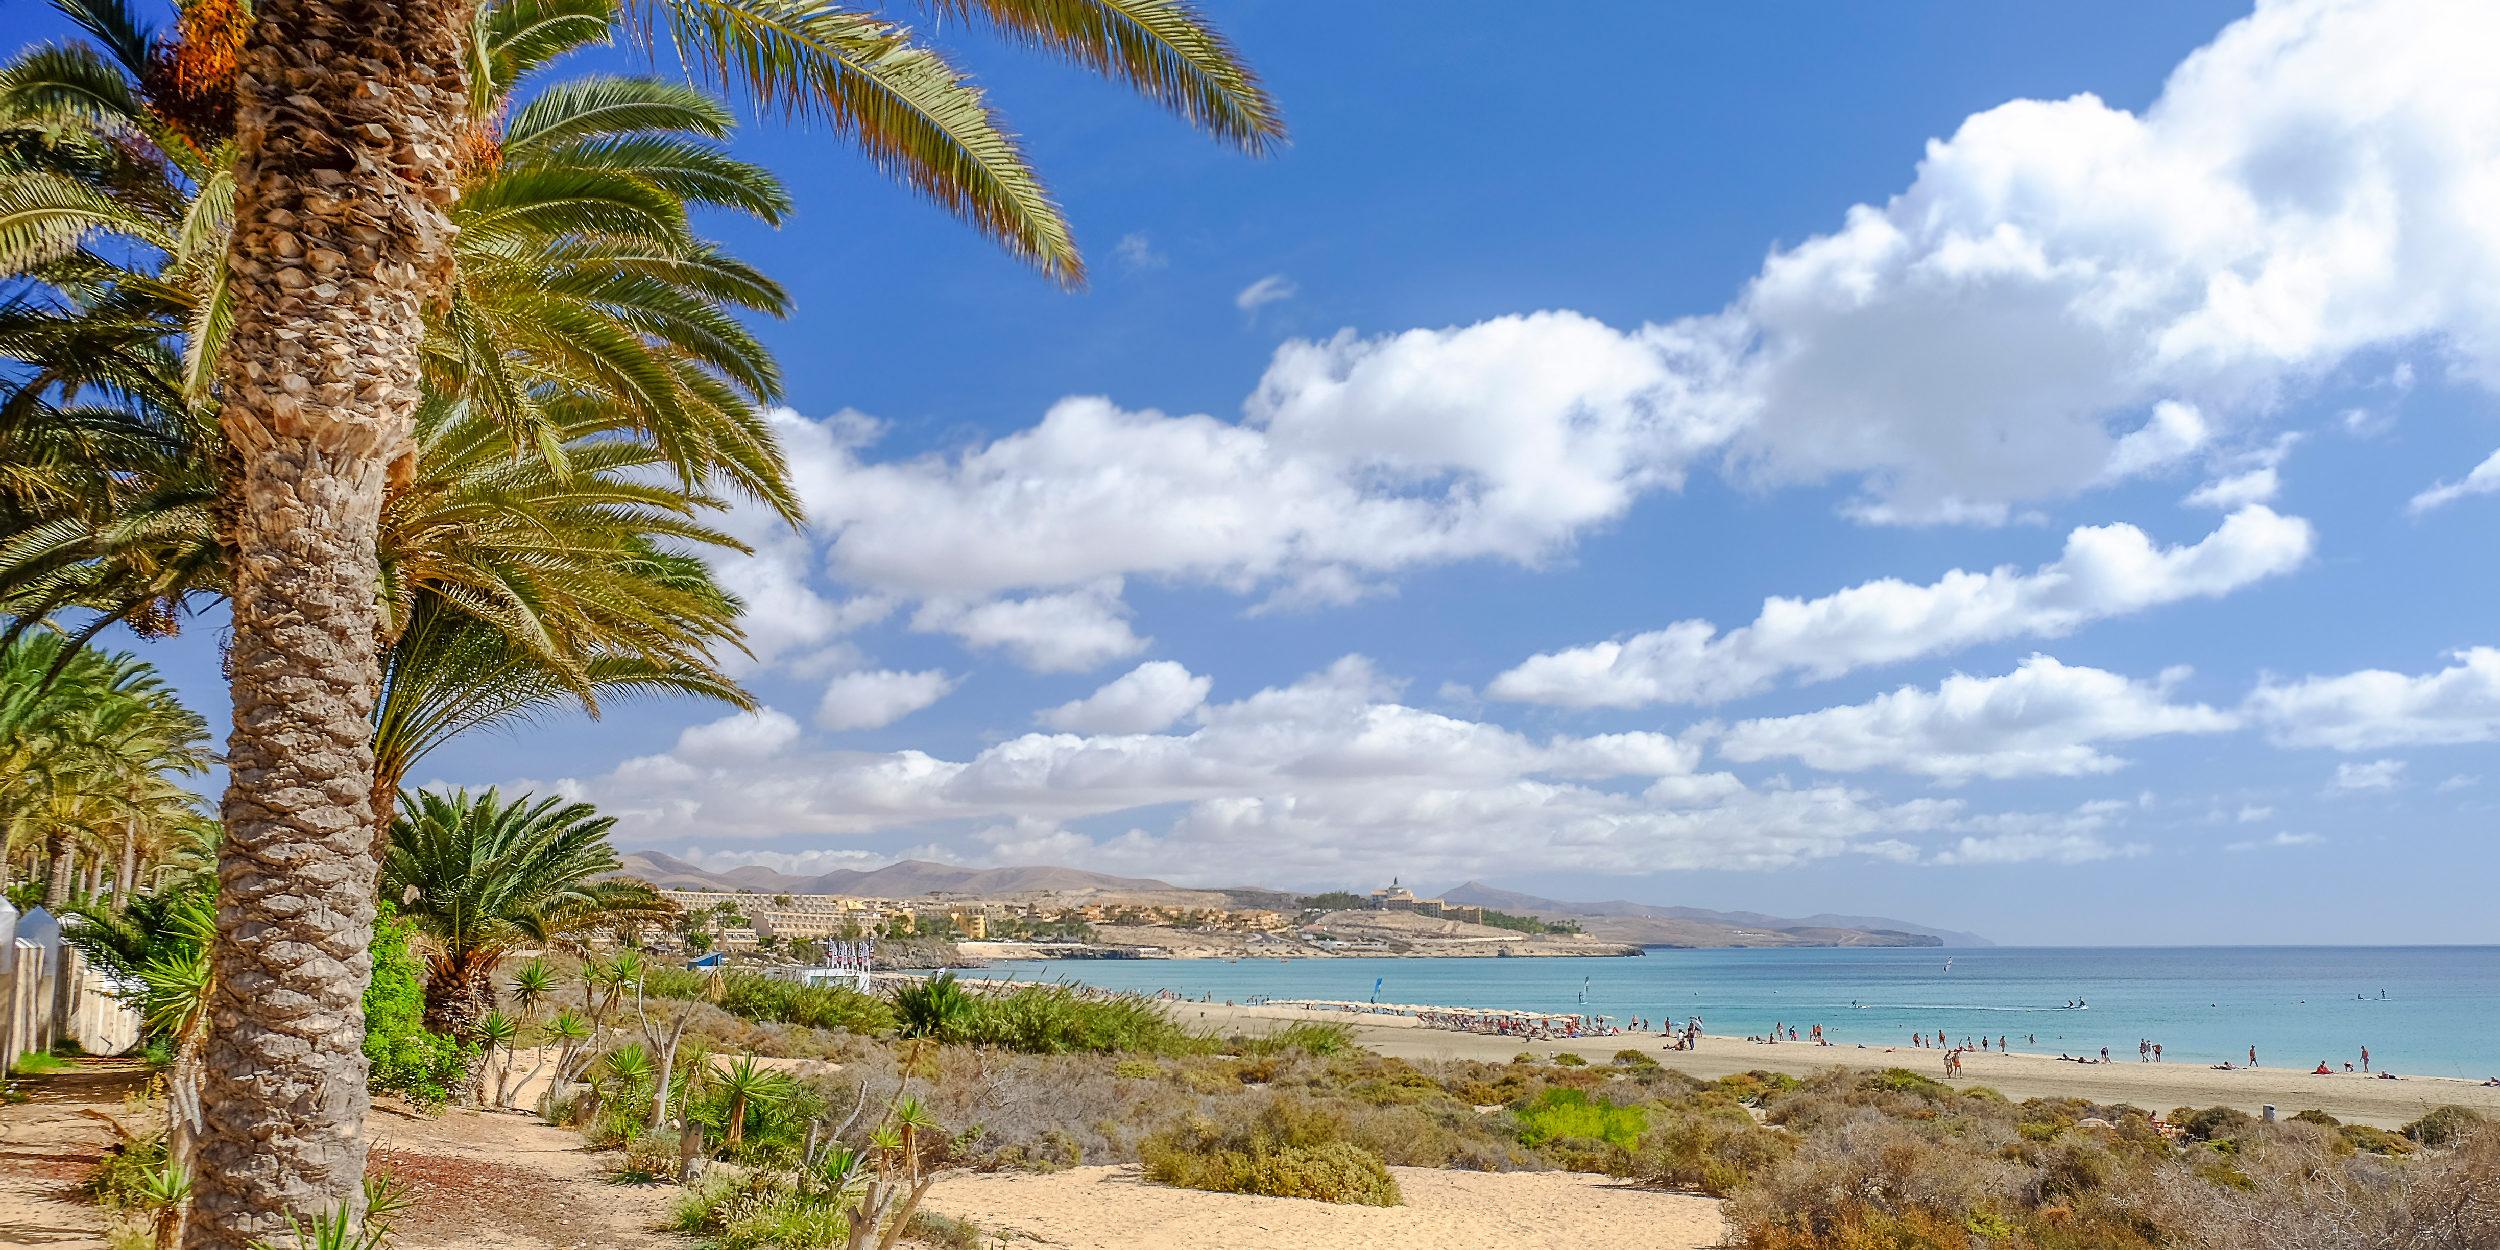 View on the Beach Playa de Costa Calma on the Canary Island Fuerteventura, Spain.